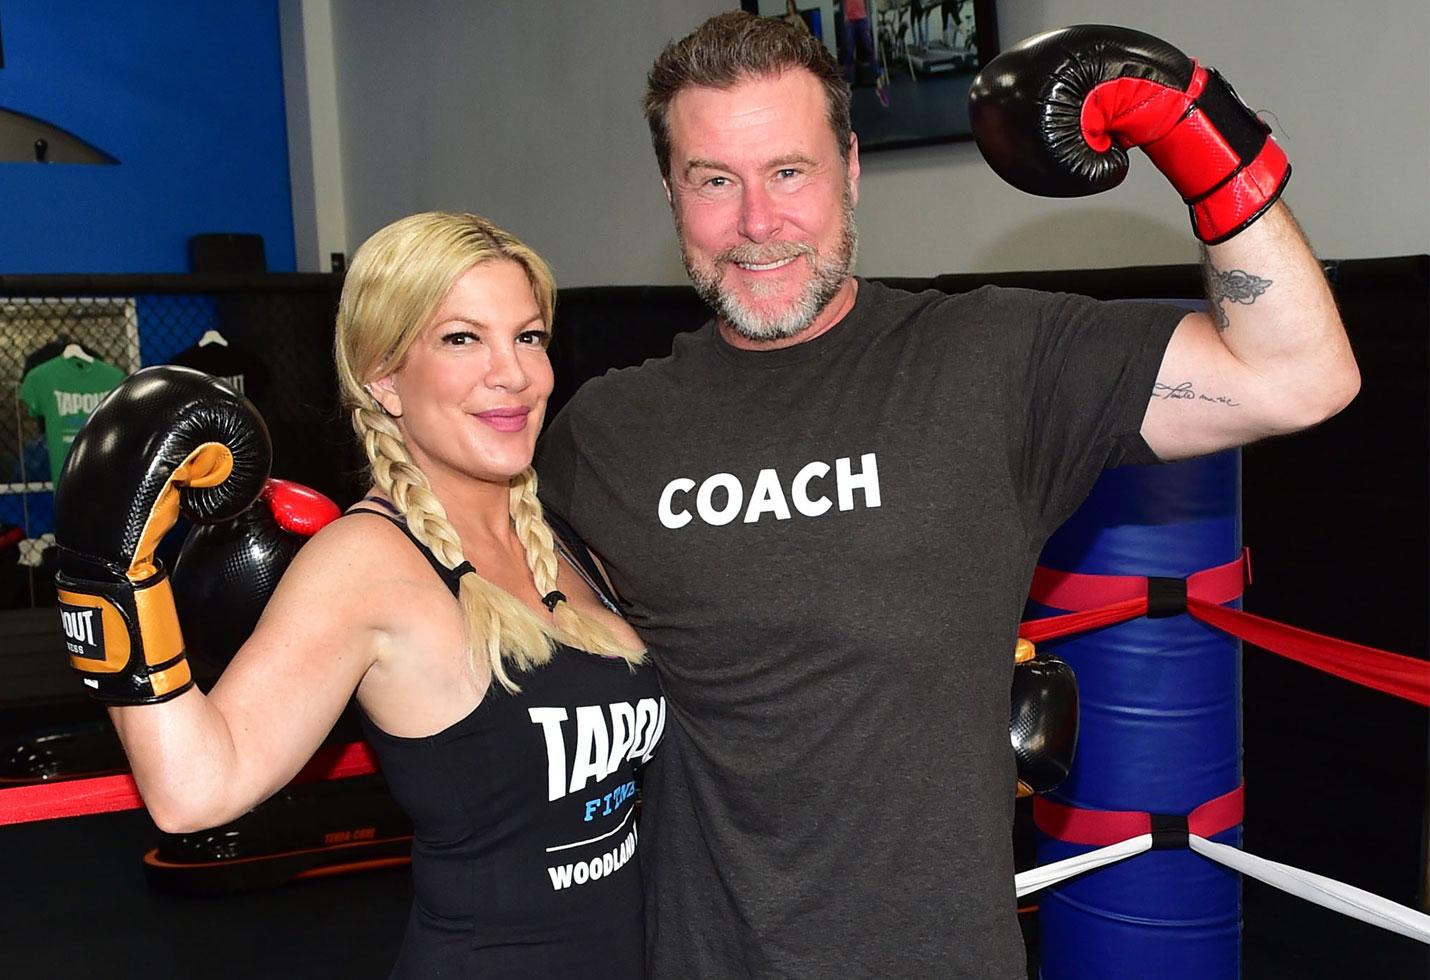 Tori spelling dean mcdermott boxing class money problems